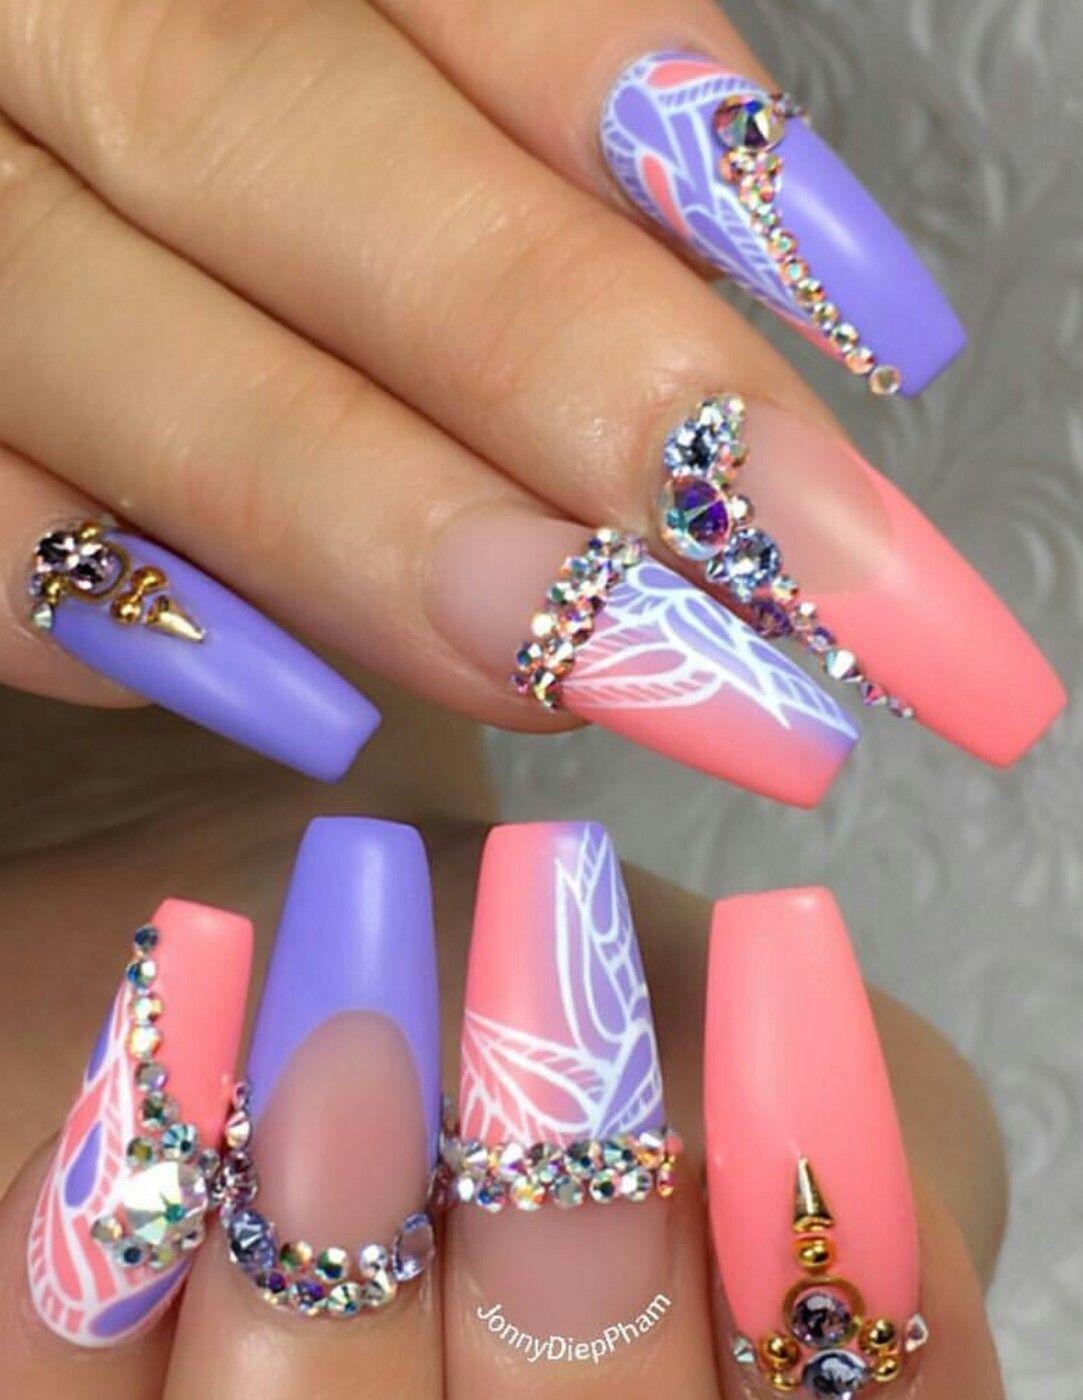 Acrylic Nail Designs with Rhinestones